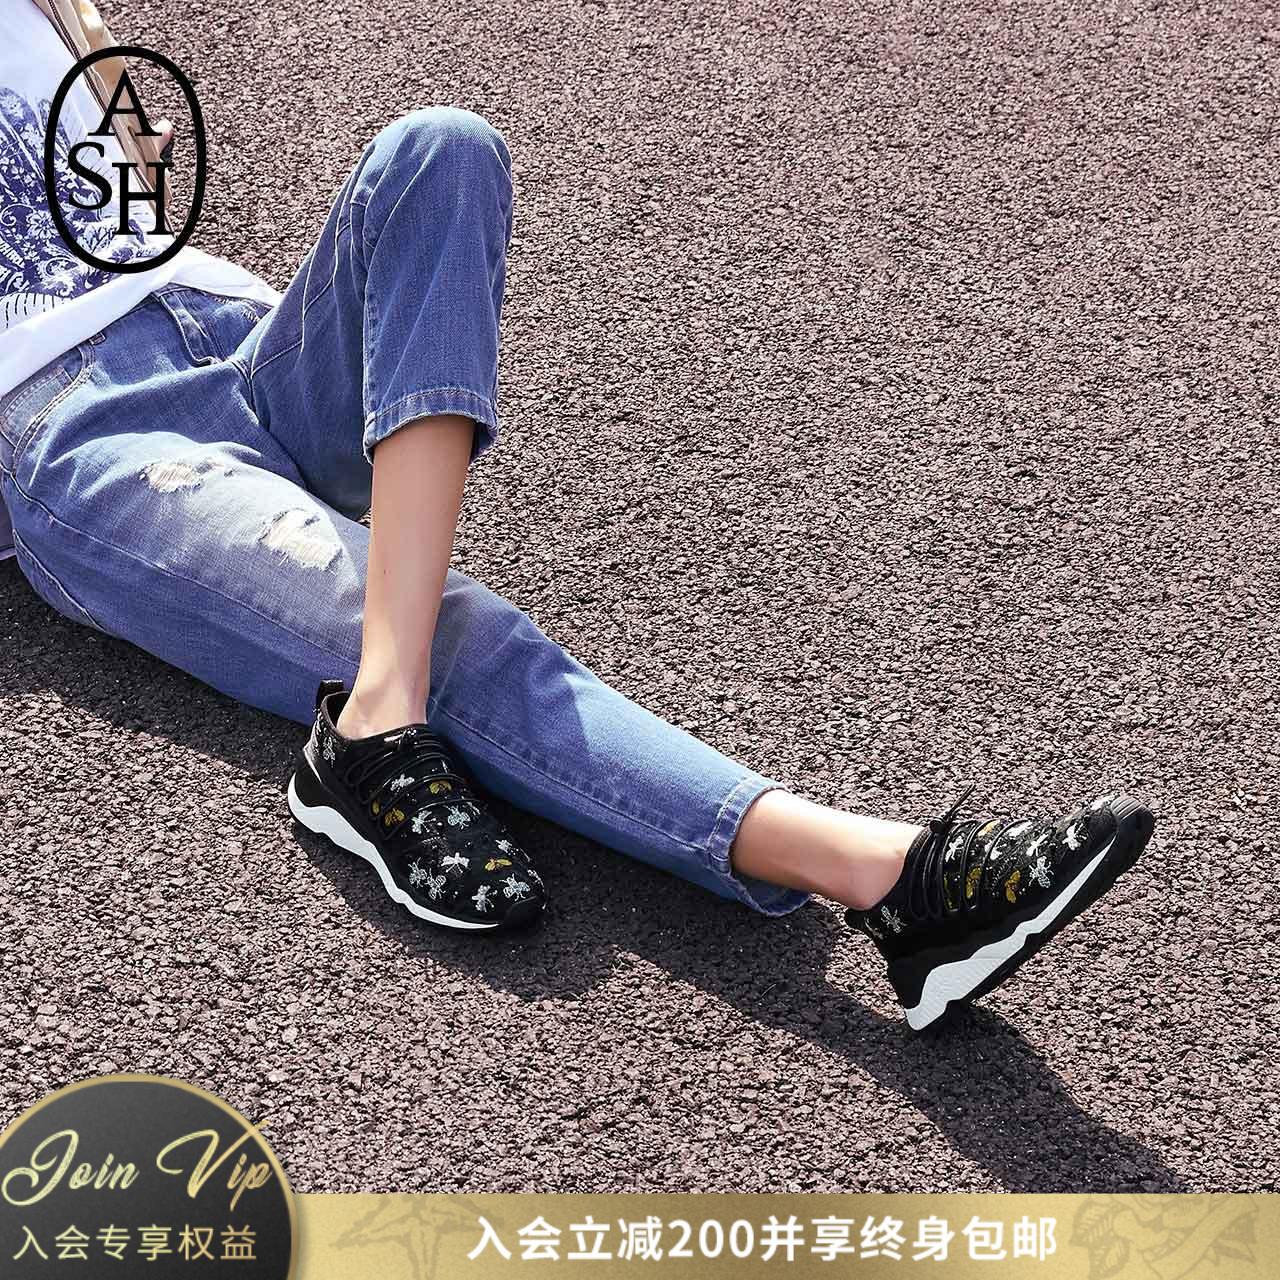 ASH女鞋2018秋季新款MISS FLY系列蝴蝶刺绣蕾丝休闲低帮运动鞋